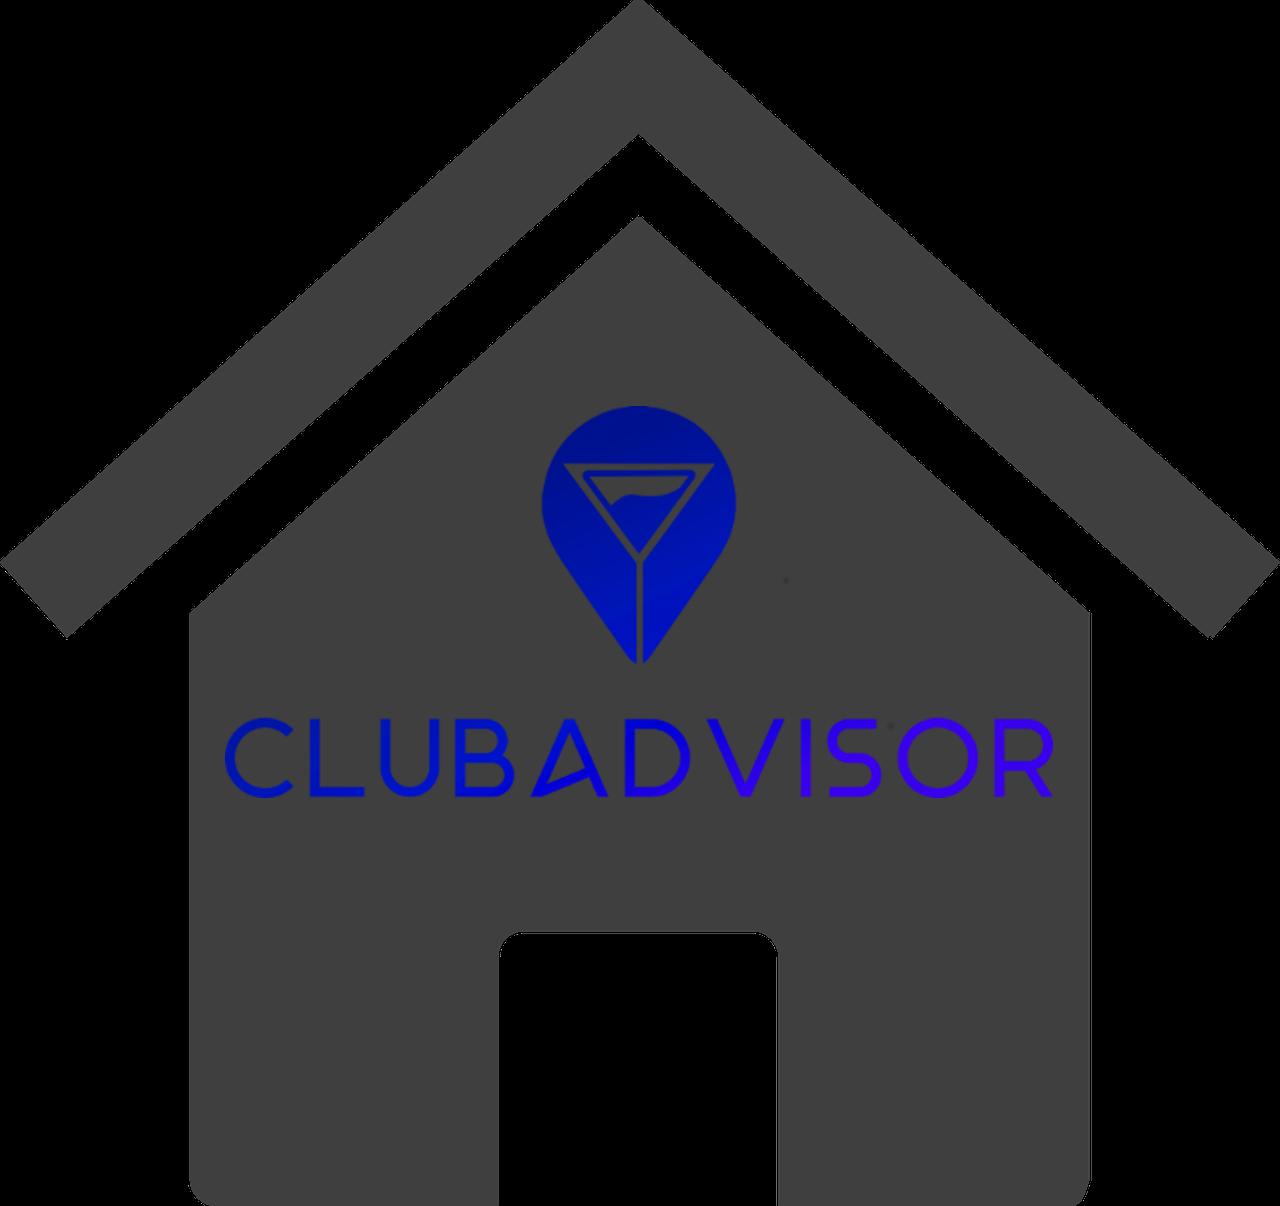 Clubadvisor-keinBild-Logo